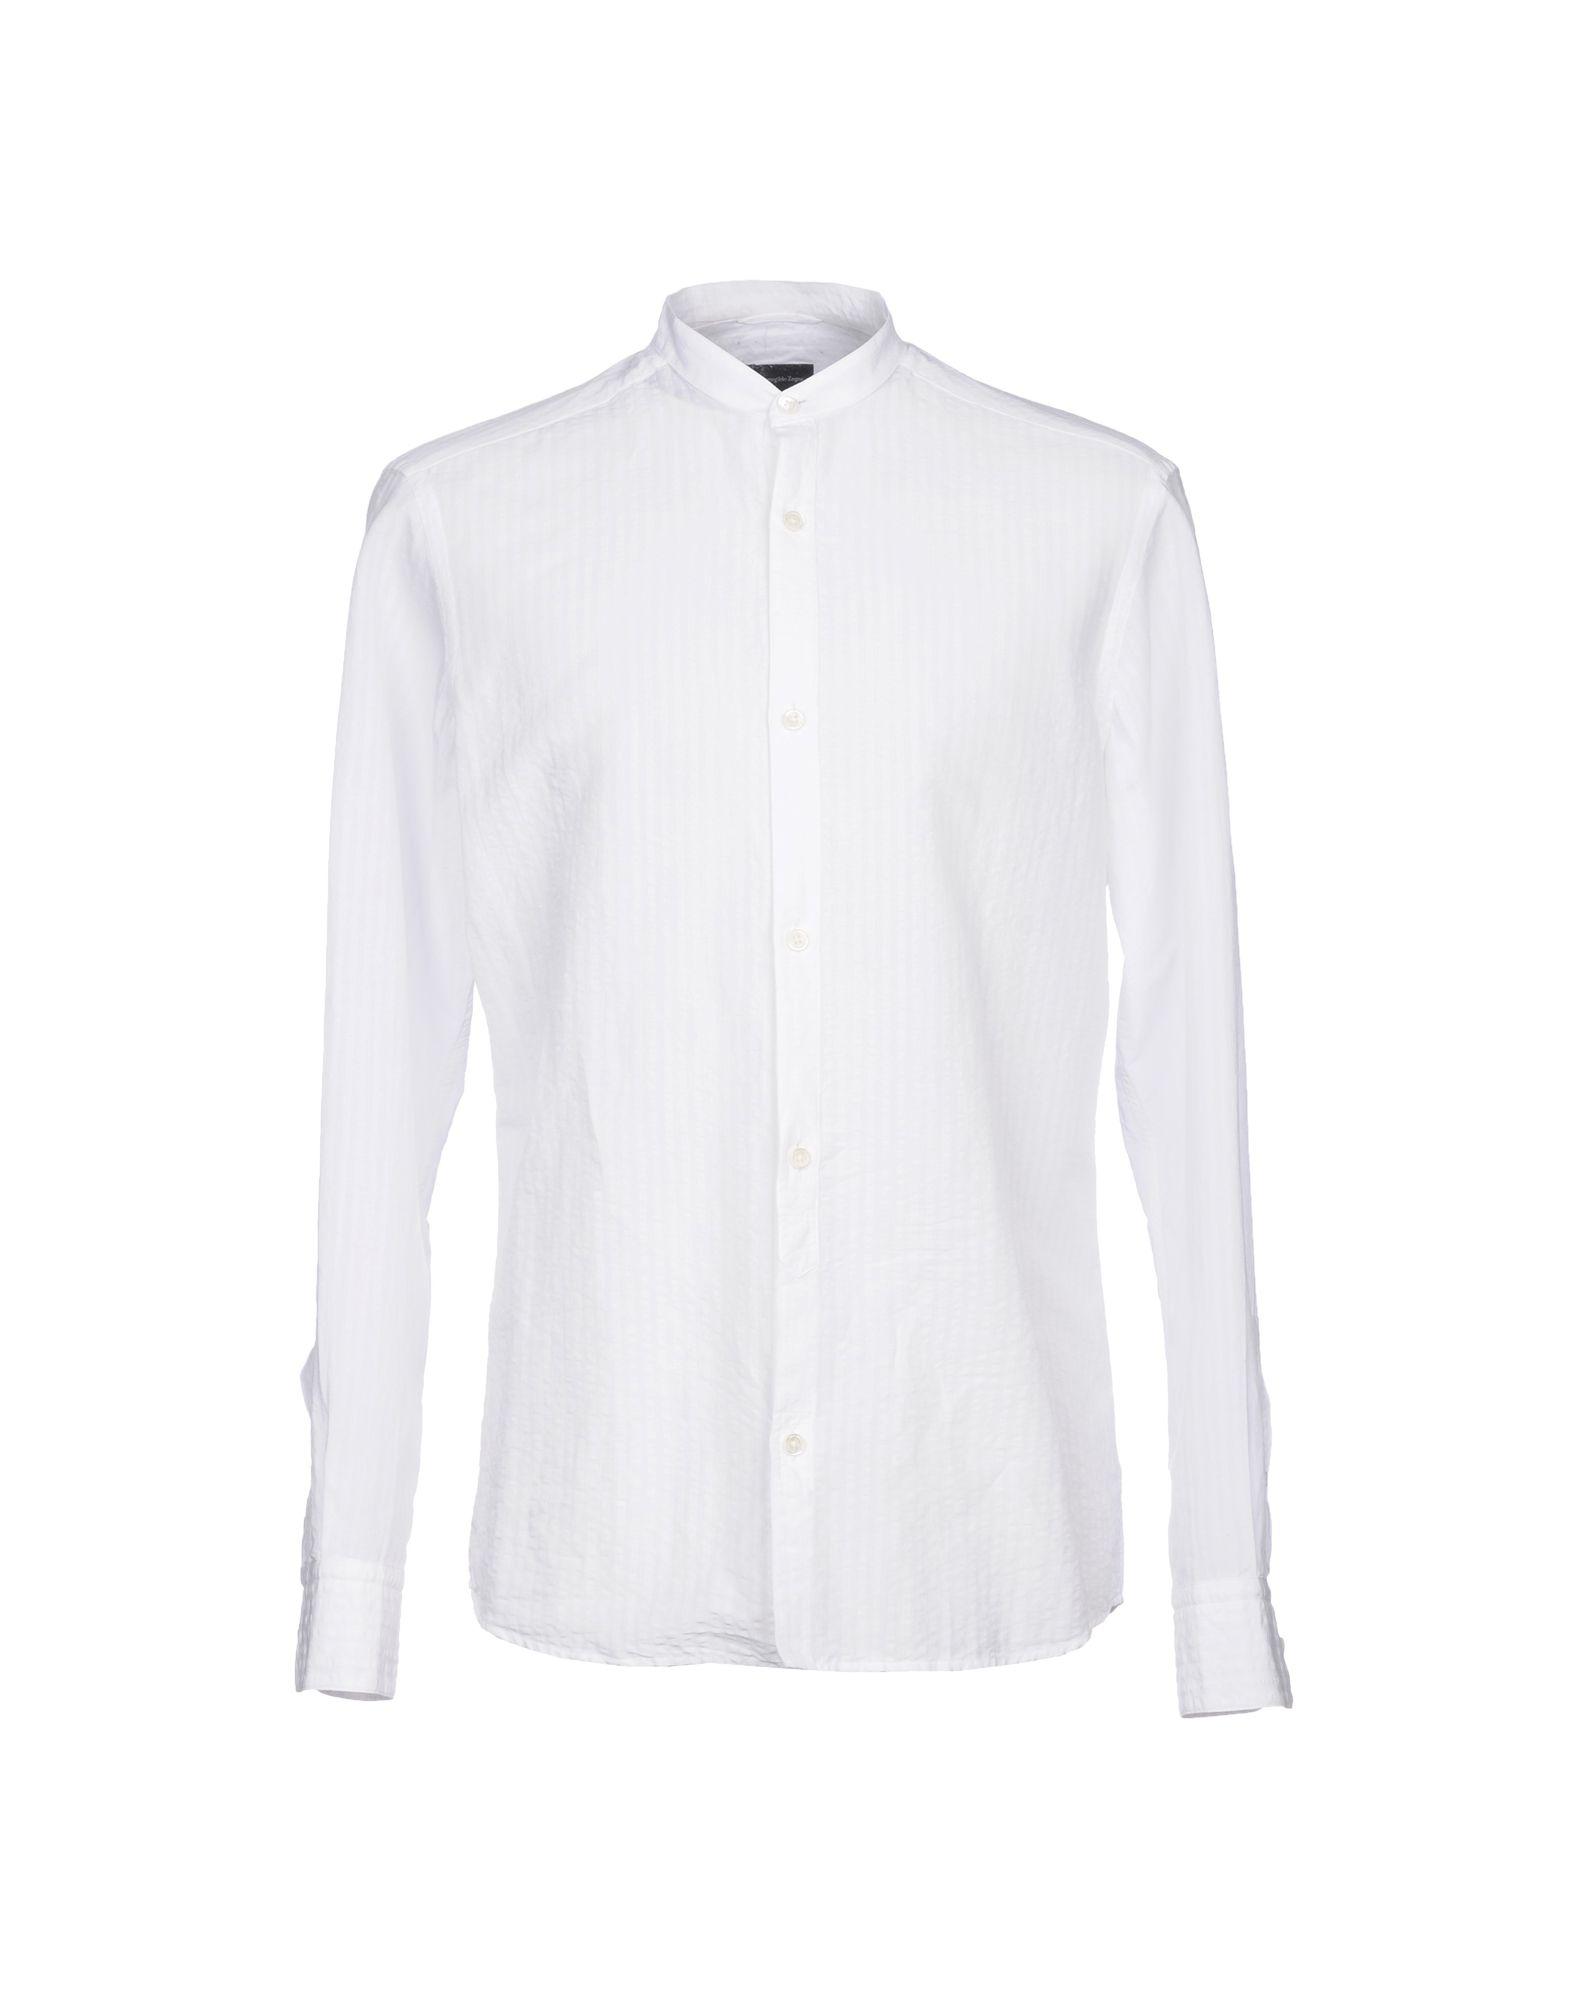 Camicia Tinta Unita Ermenegildo Zegna Uomo - Acquista online su